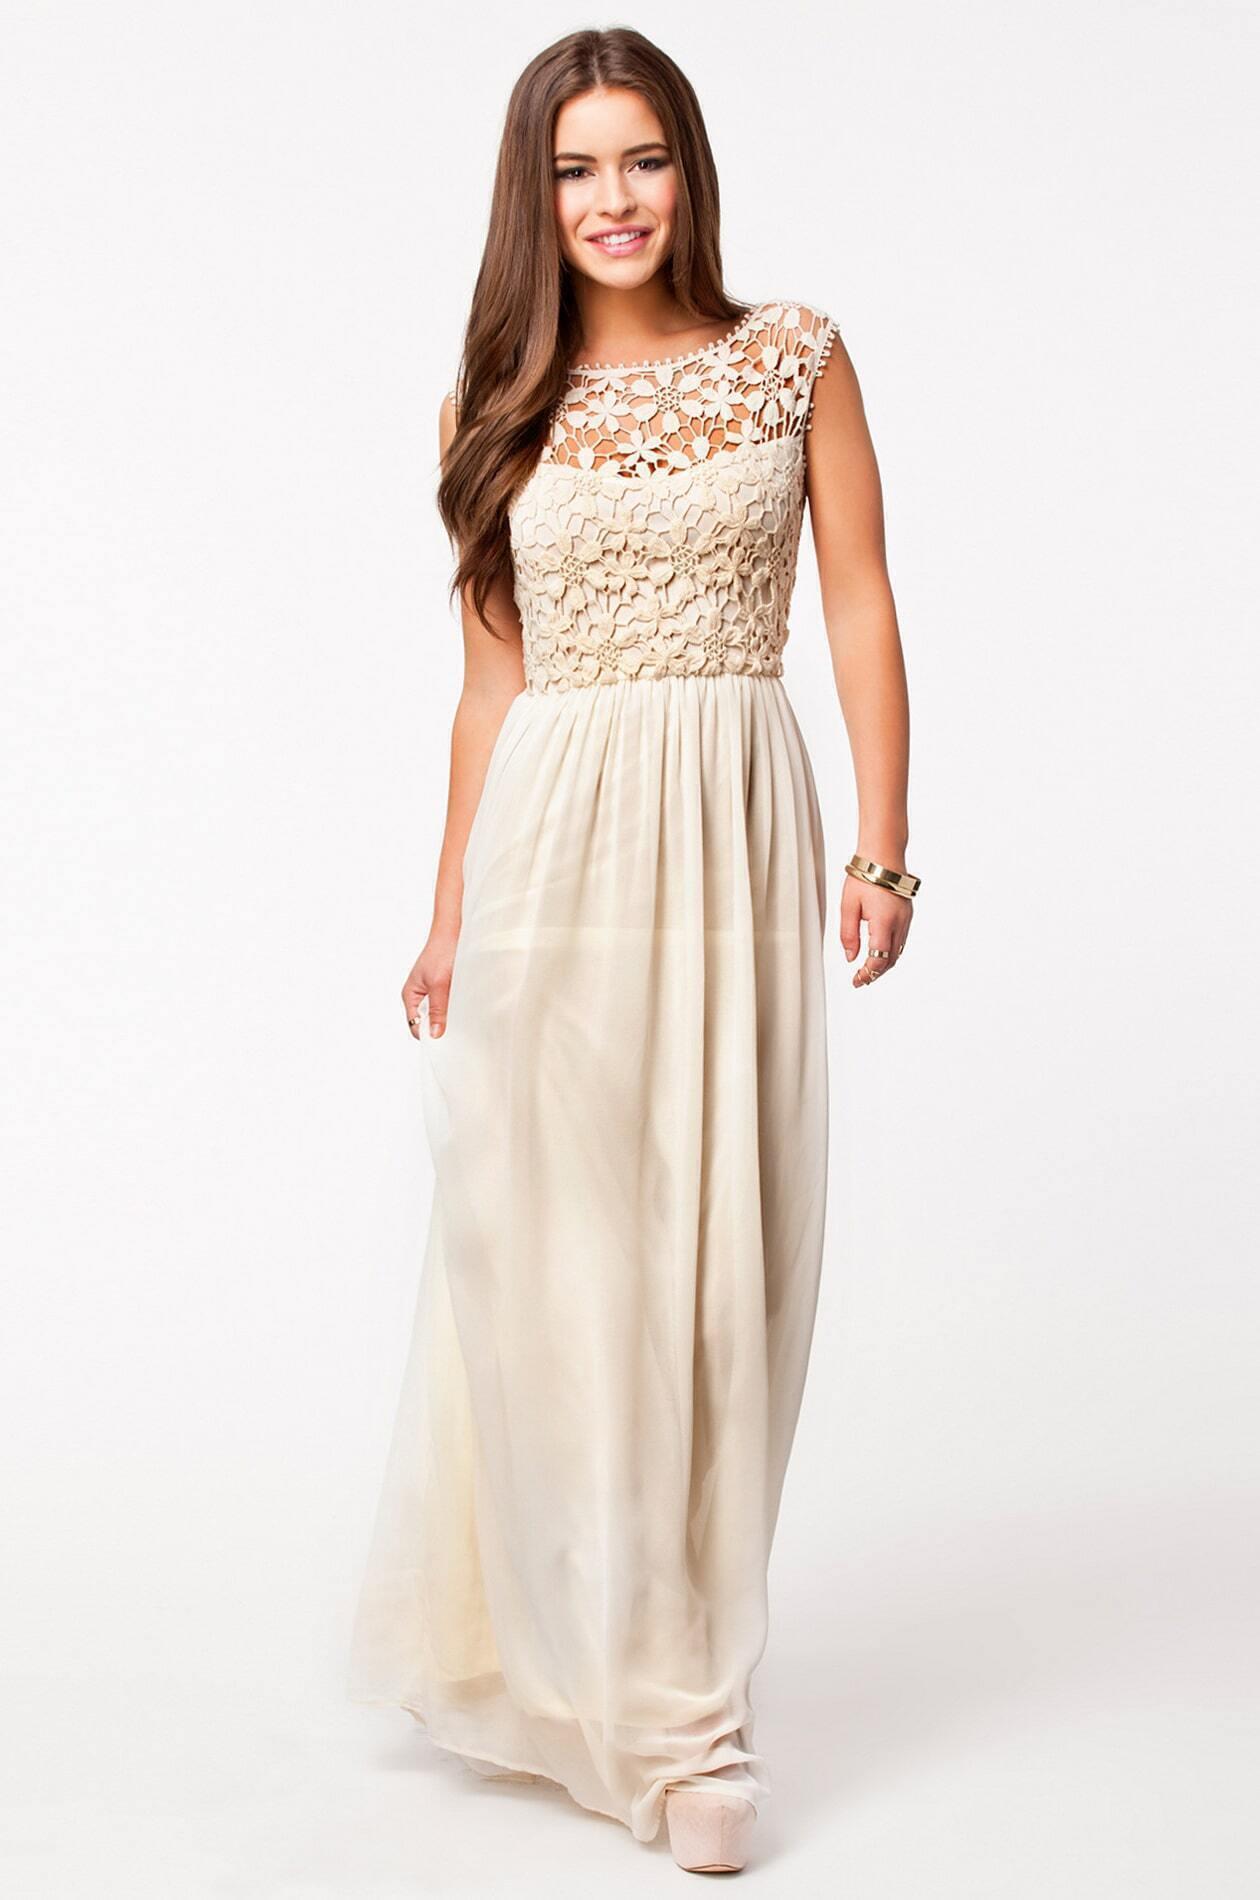 b2e4d988547597 Apricot Sleeveless Floral Crochet Lace Ball Maxi Dress EmmaCloth-Women Fast  Fashion Online